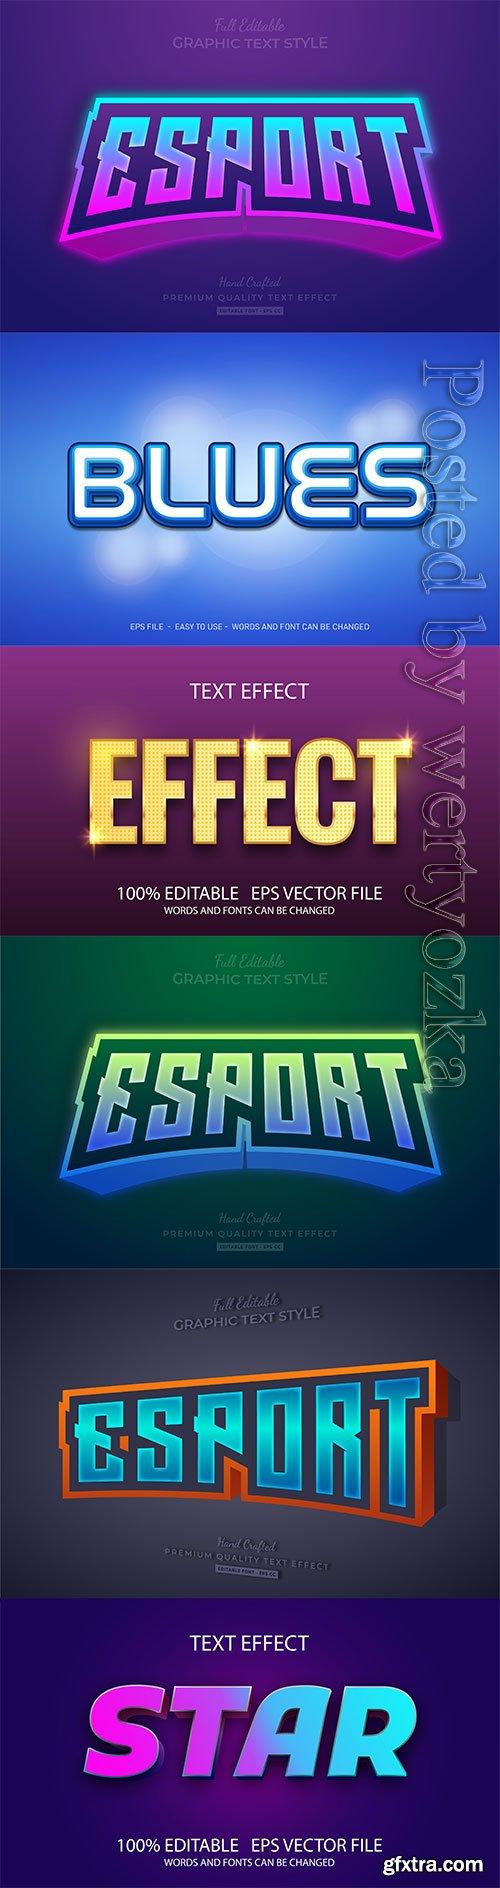 3d editable text style effect vector vol 257